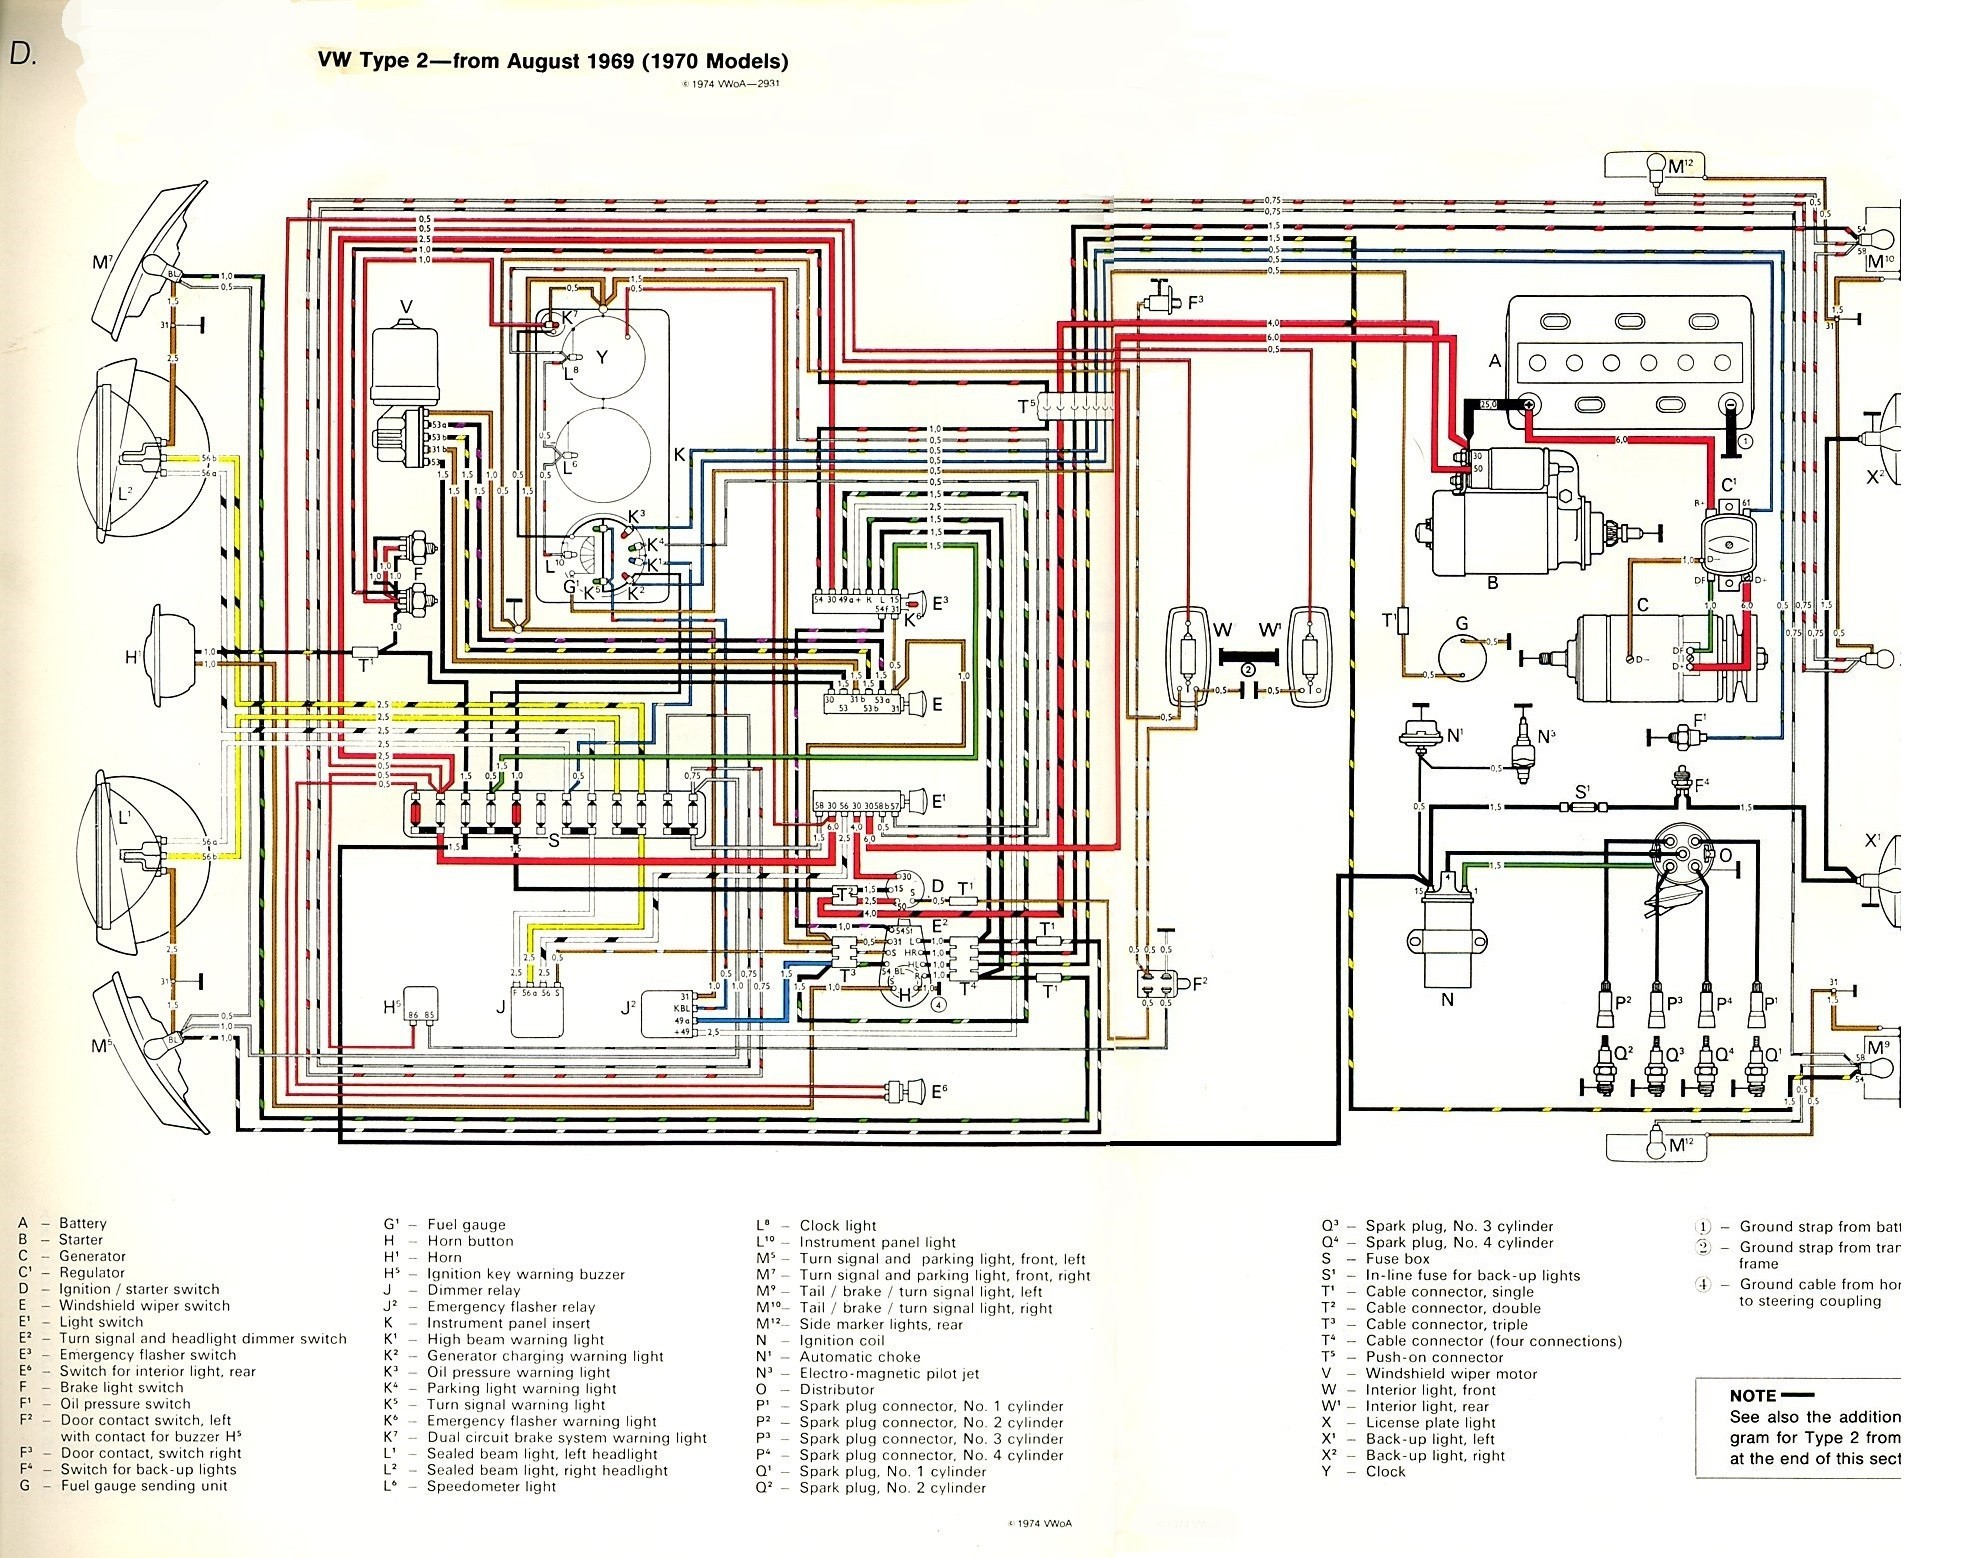 68 camaro rear harness diagram - wiring diagram options wall-neutral -  wall-neutral.studiopyxis.it  pyxis